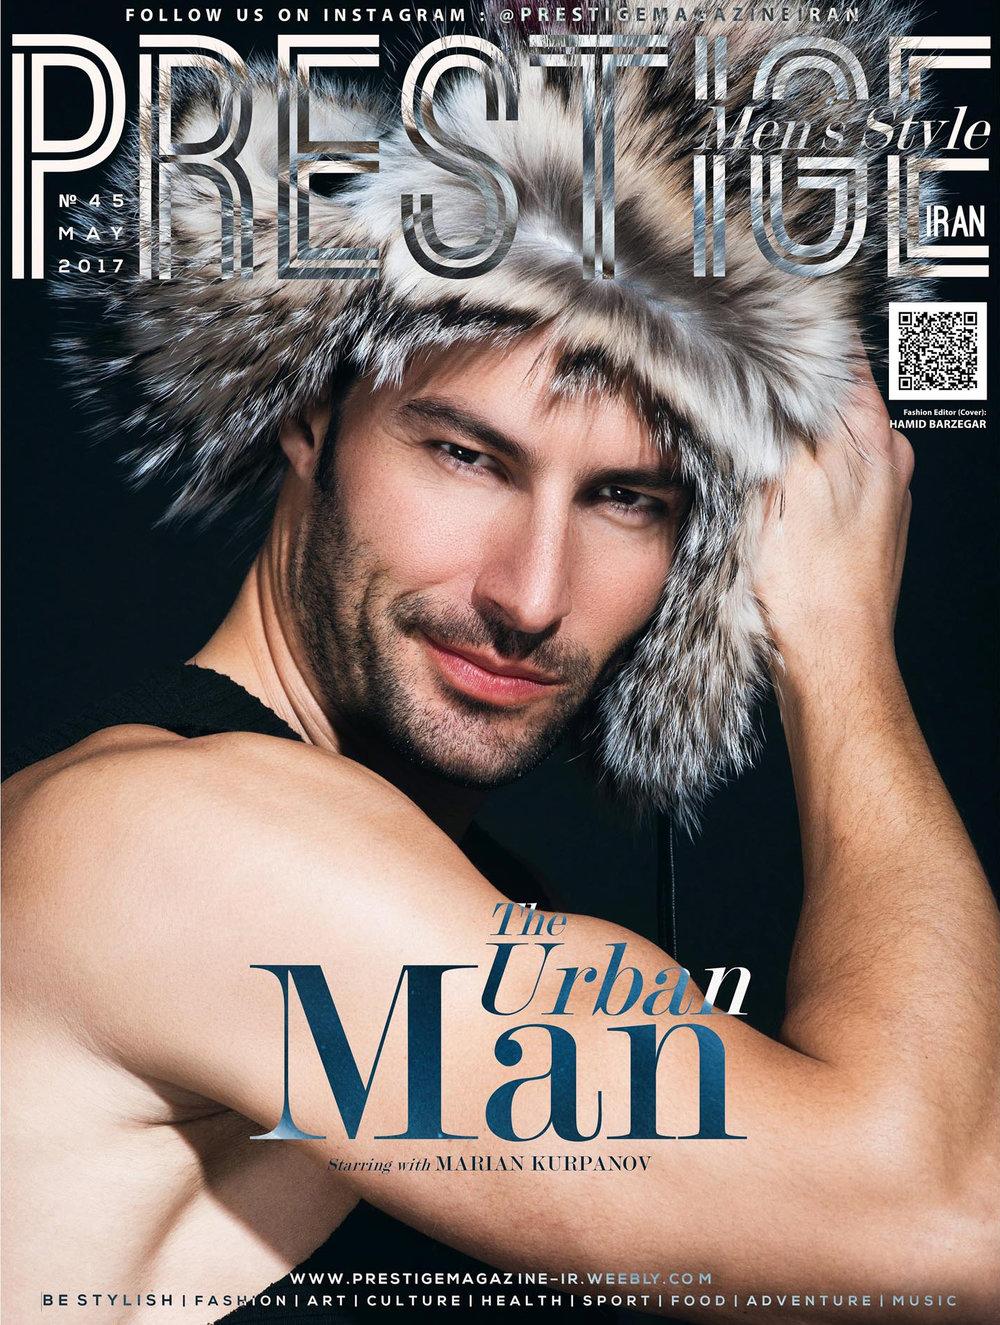 Prestige Men's Style Magazine - N.45 May 2017 Issue-1.jpg